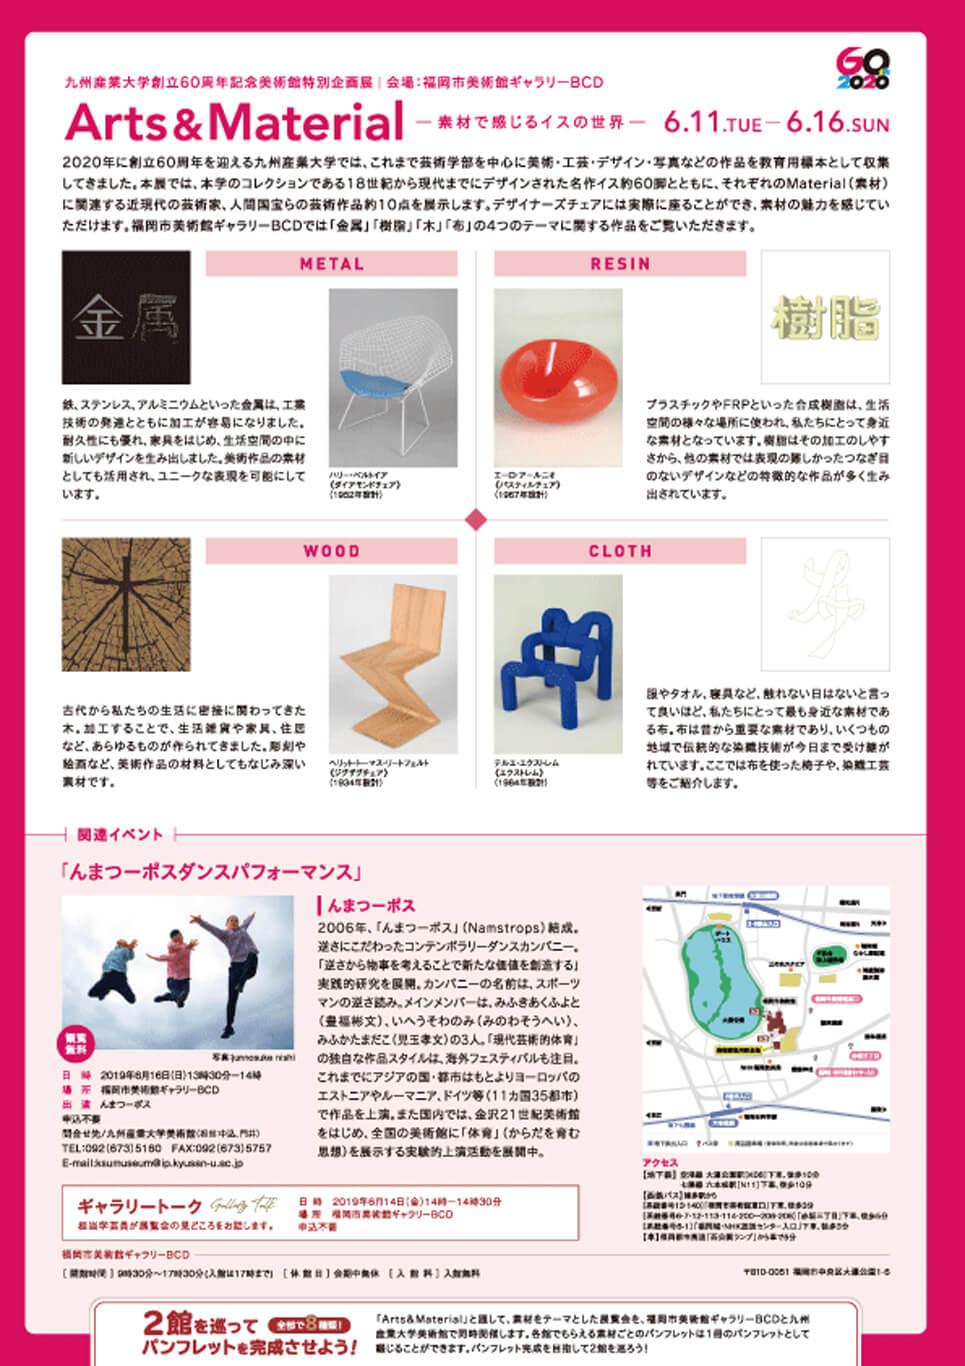 mksu-201906-Arts & Material-1